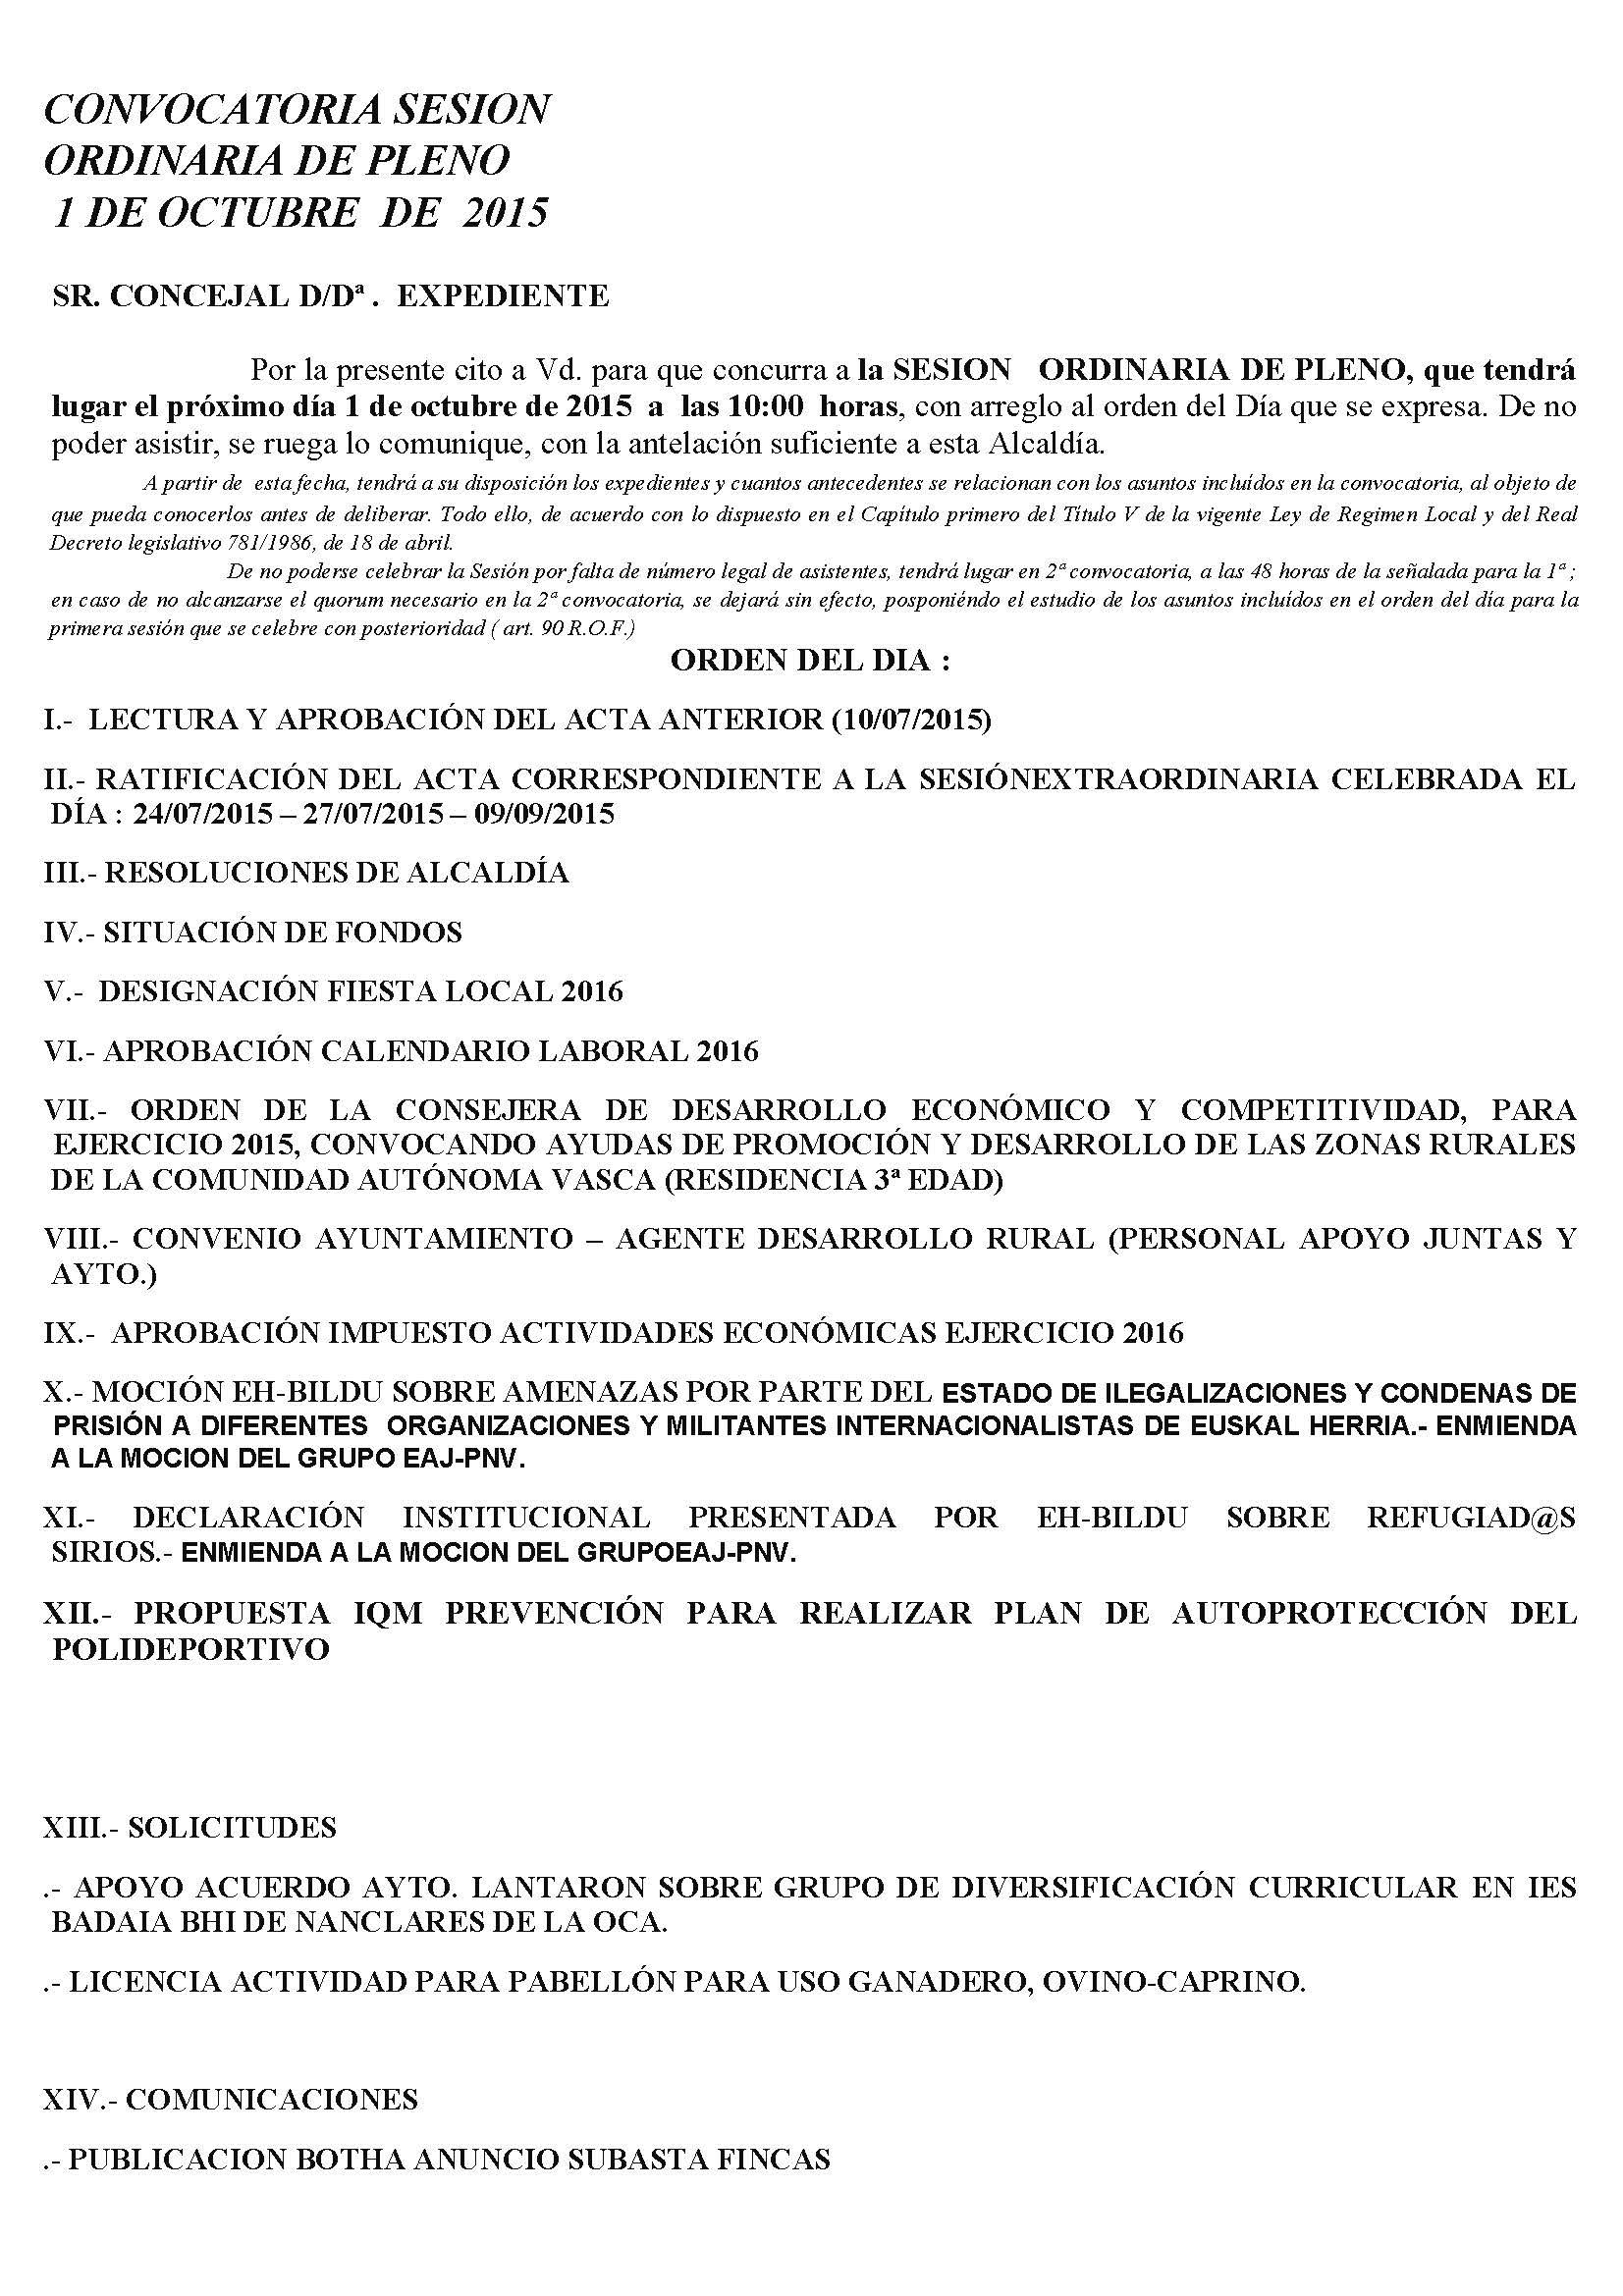 convocatoria 1 oct 2015_Página_1